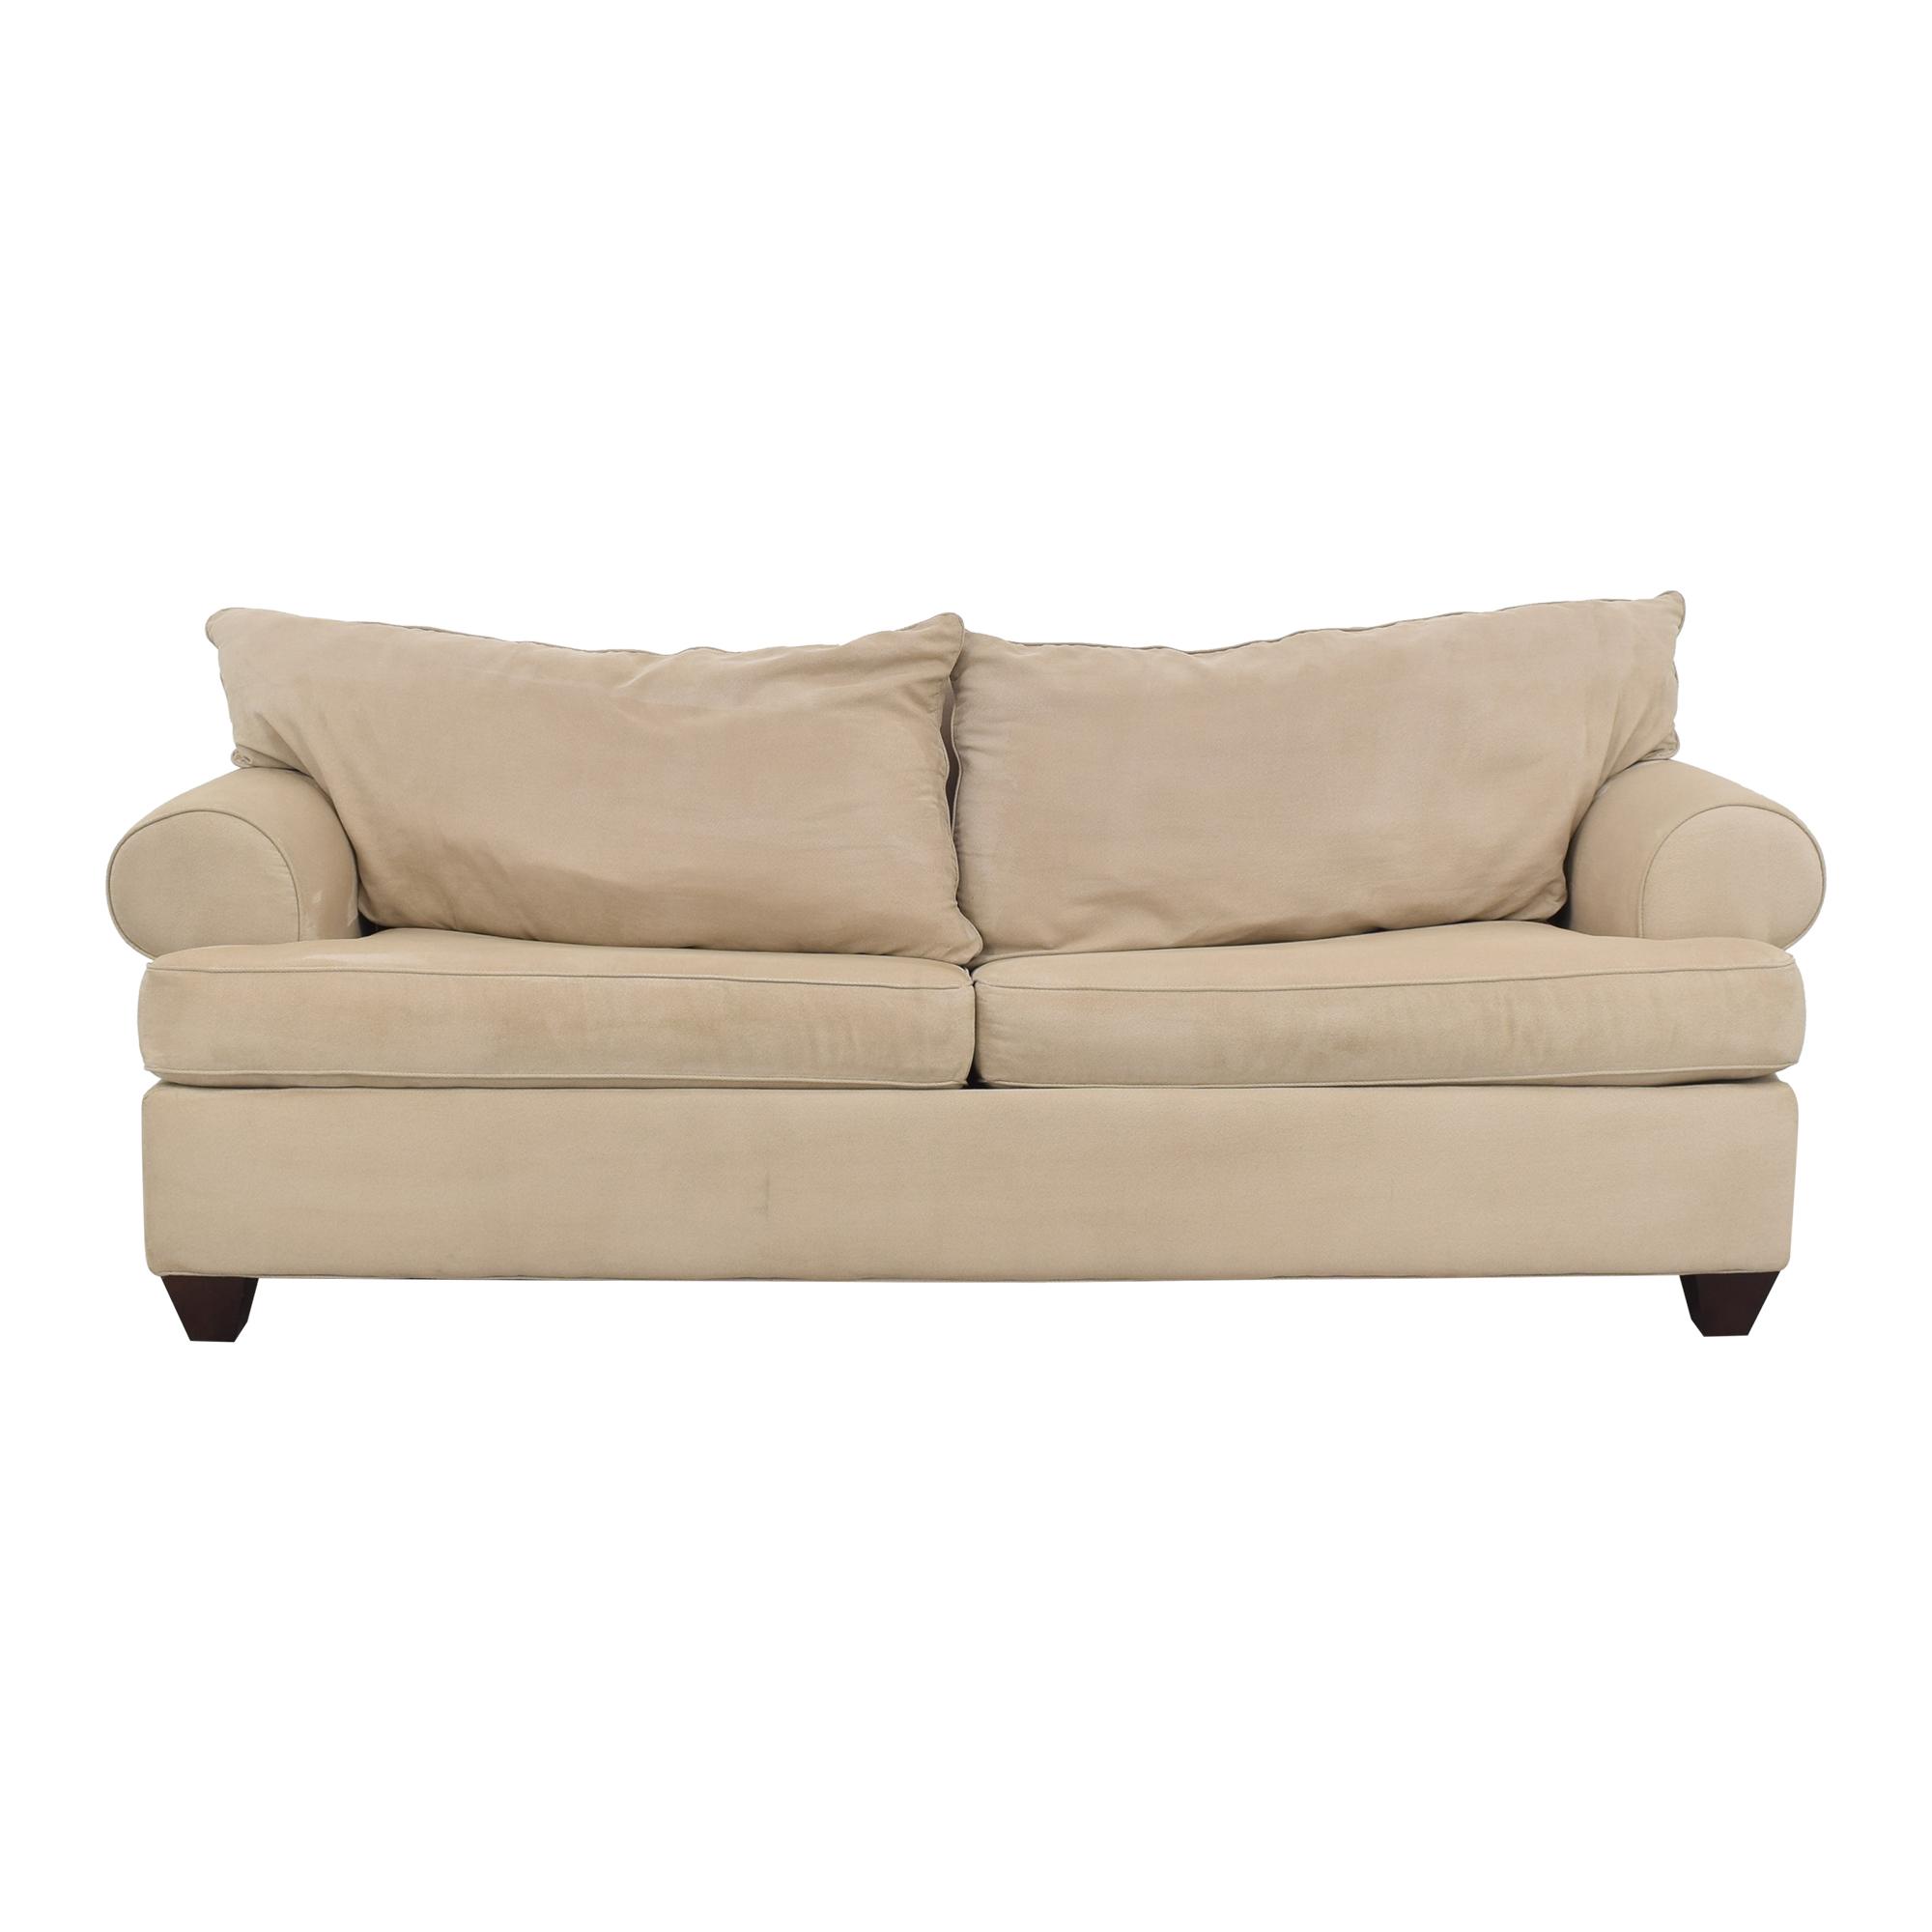 Raymour & Flanigan Raymour & Flanigan Sleeper Sofa